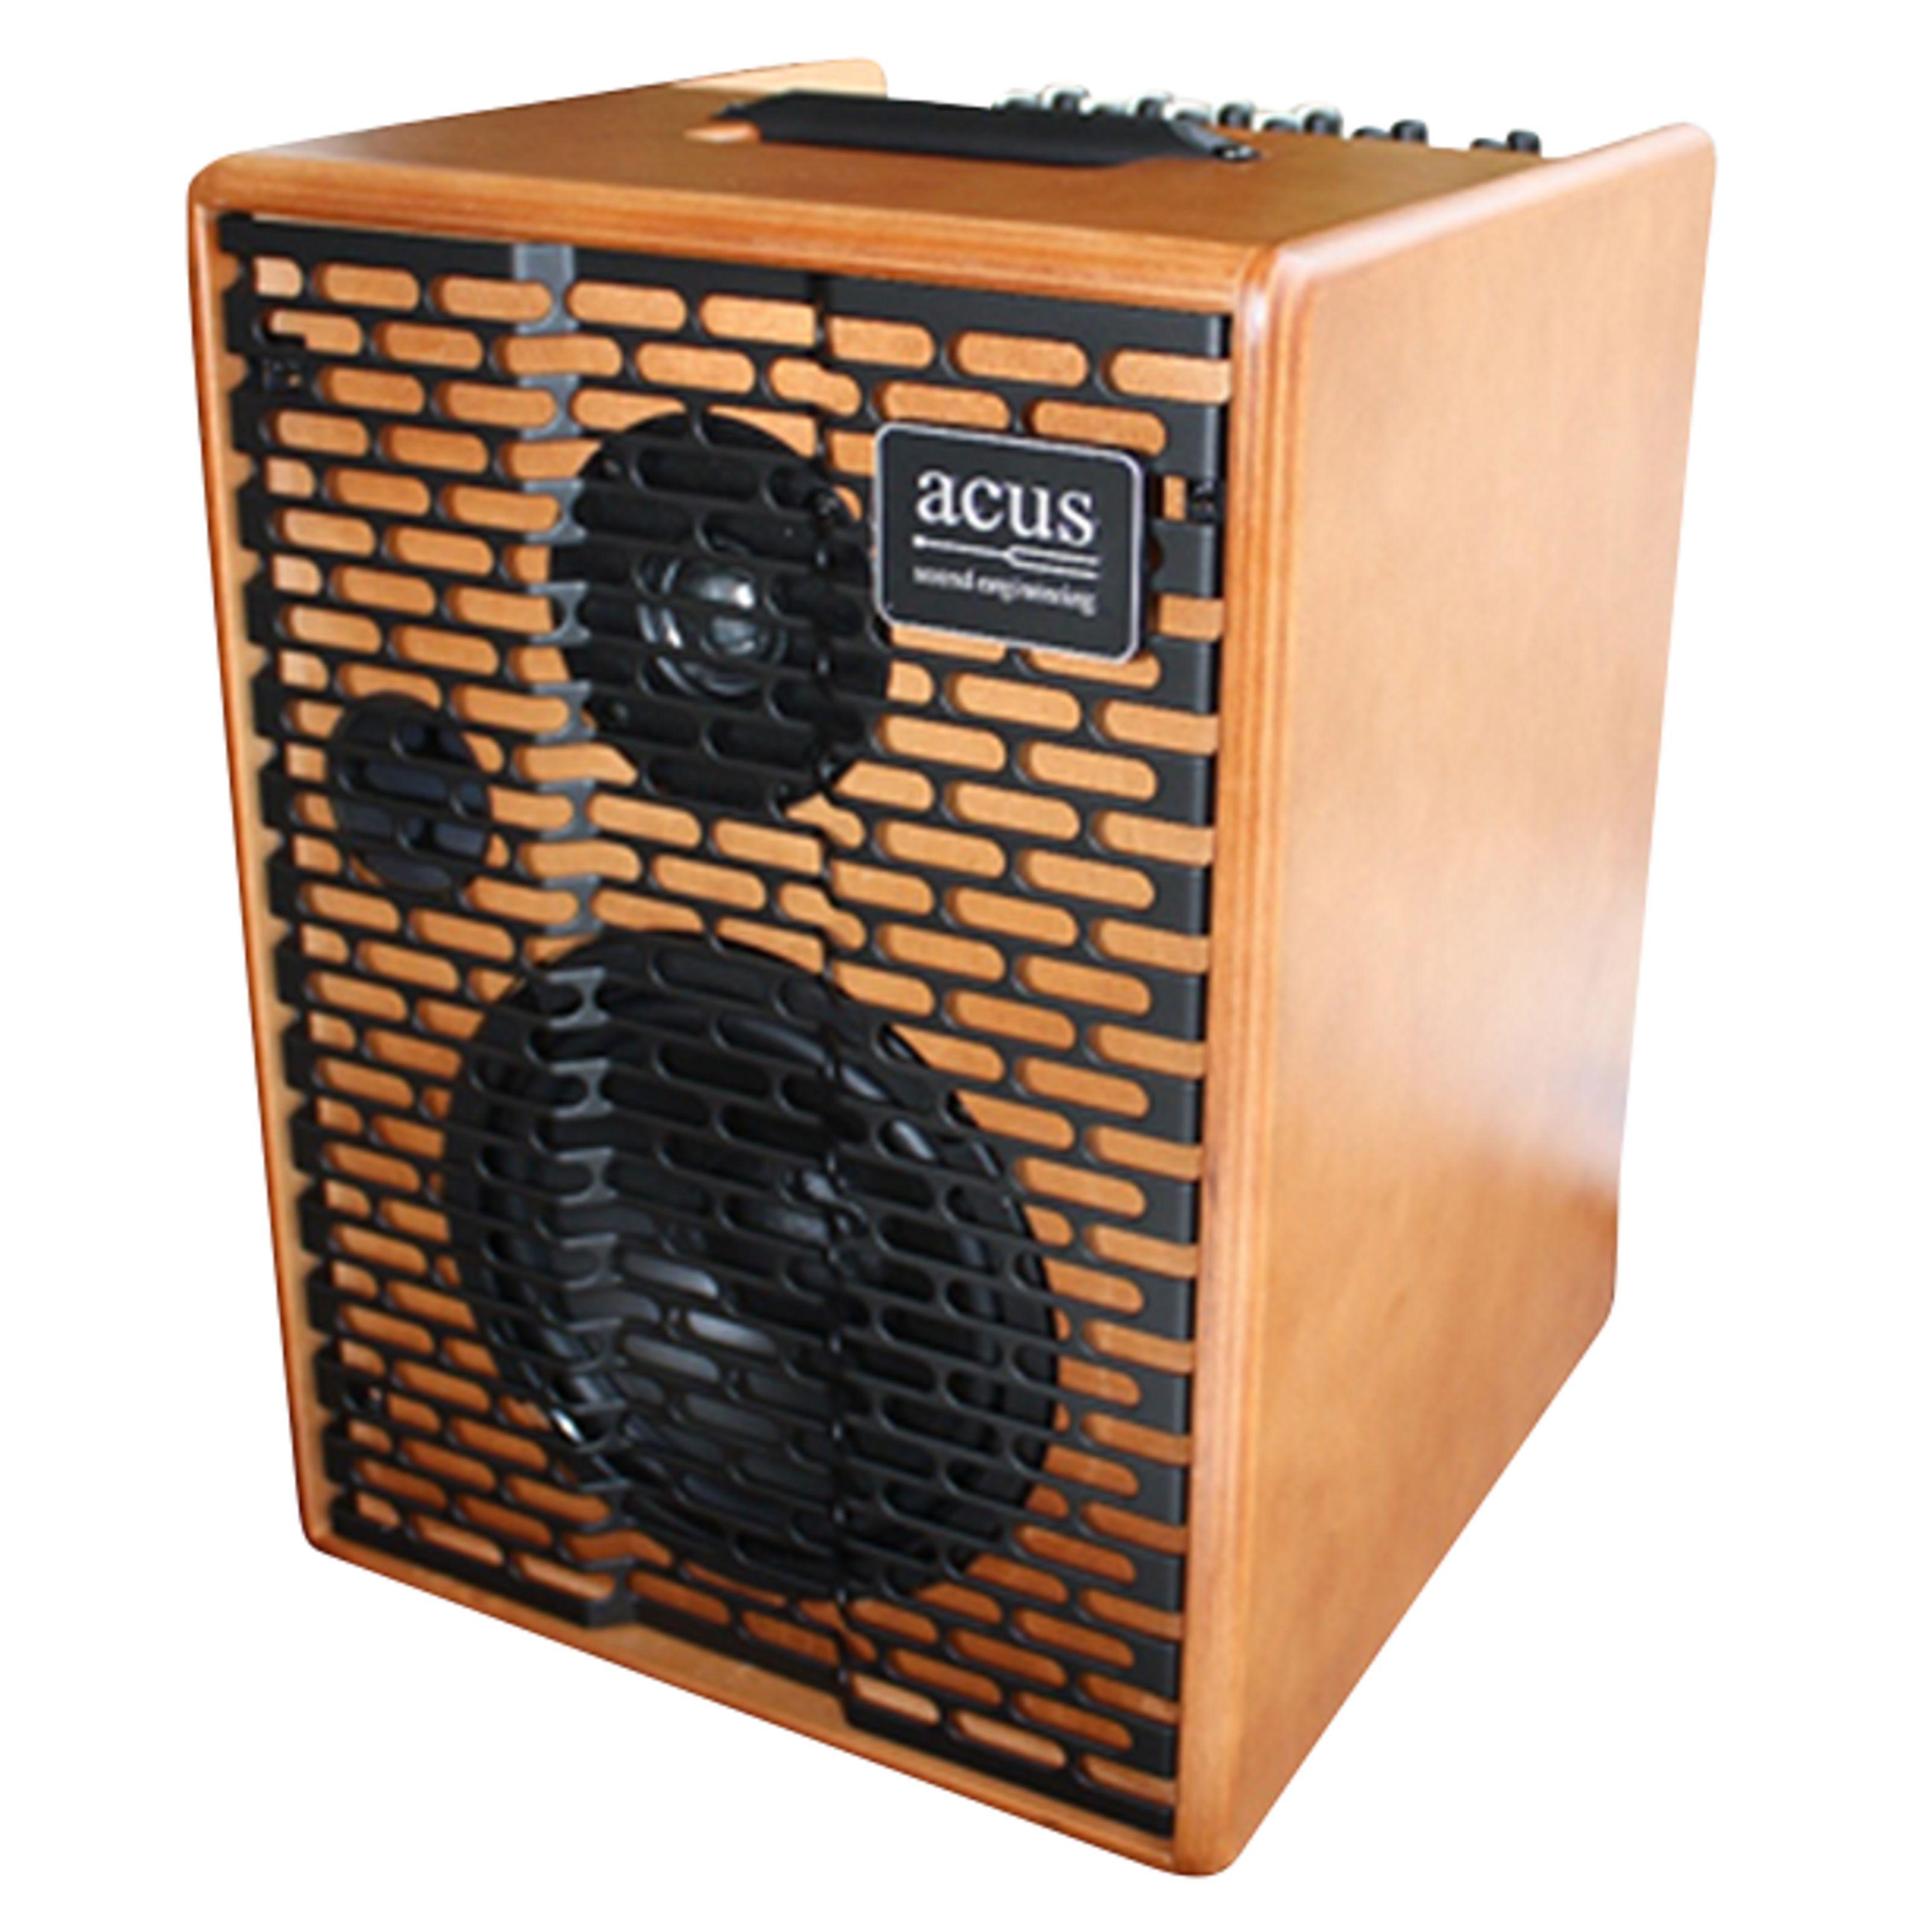 Acus - One for Street Wood Akku-Amp